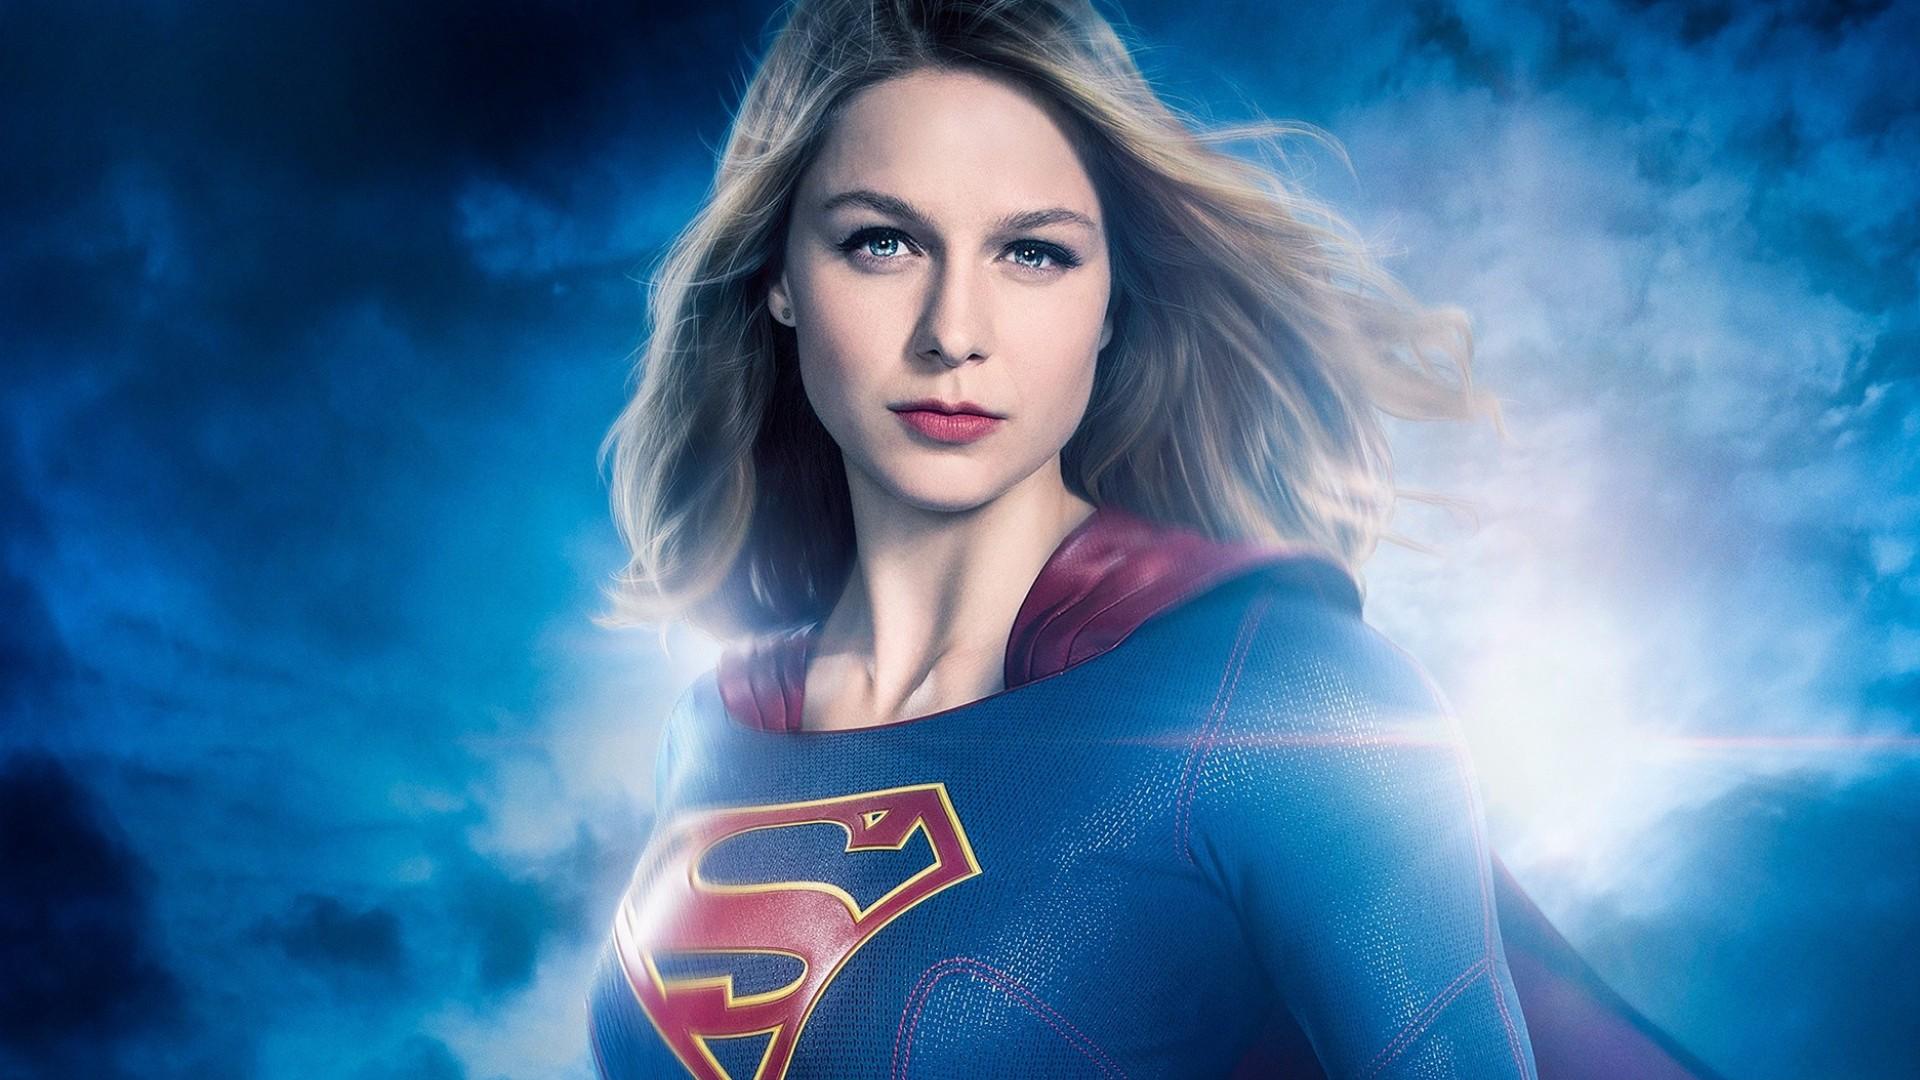 supergirl seyrederiz